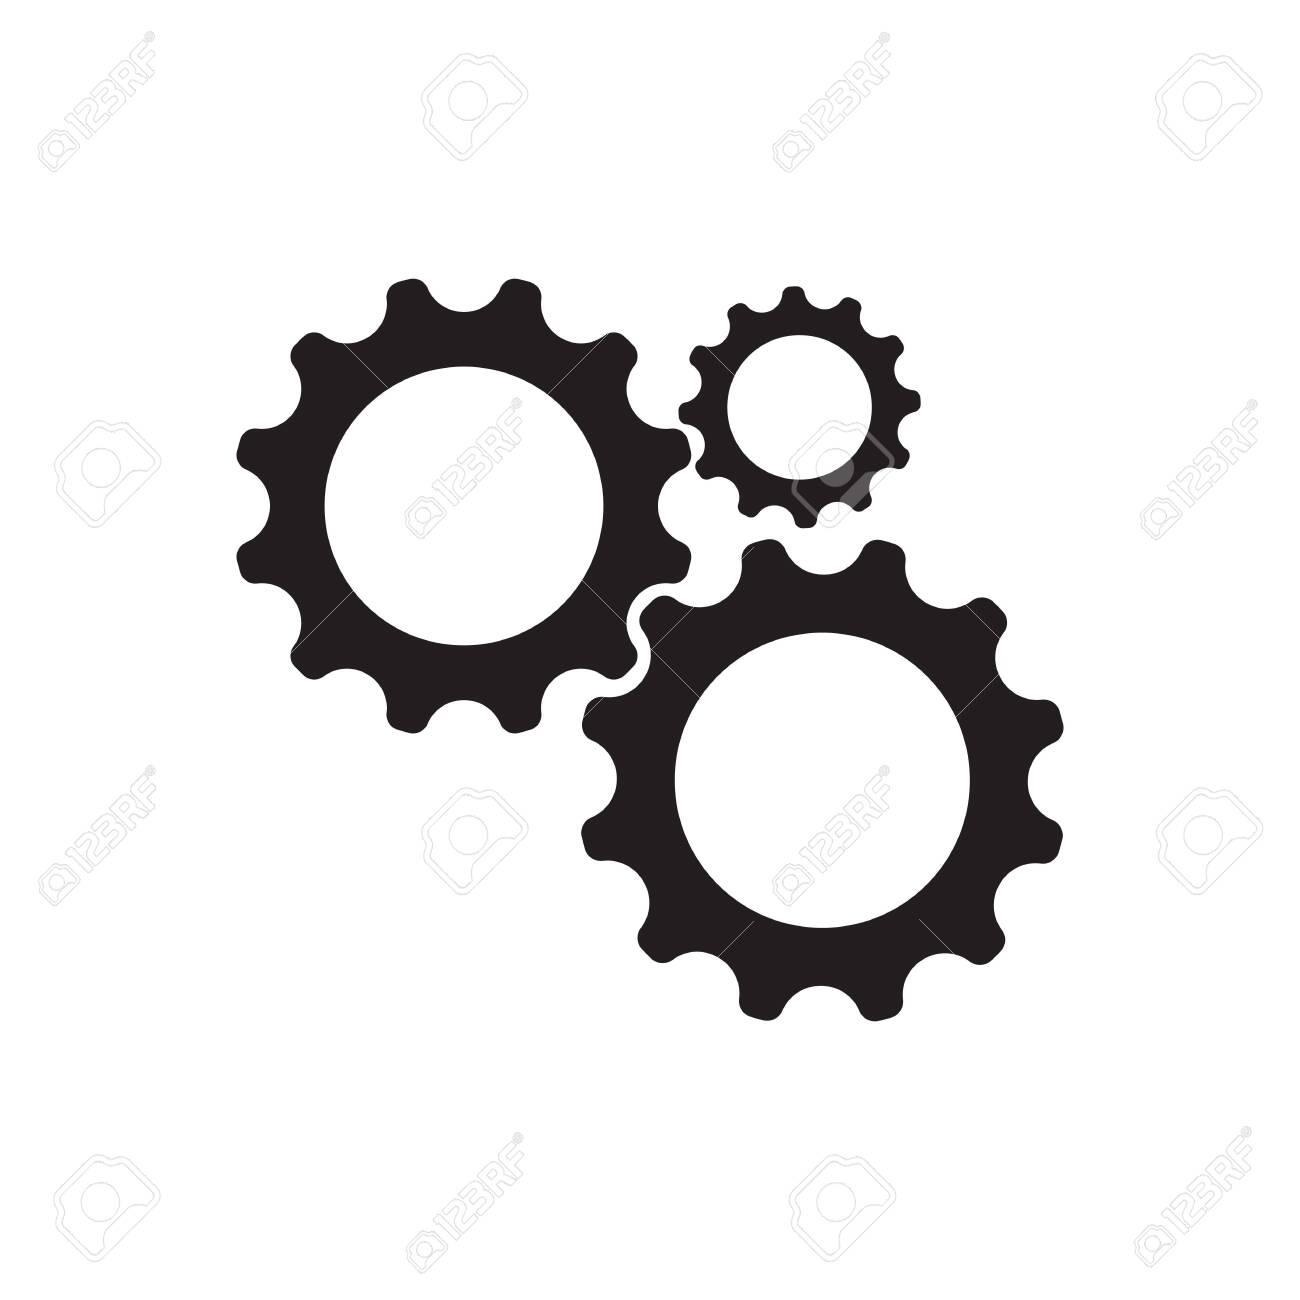 Gear Logo Template vector icon illustration design - 129150581